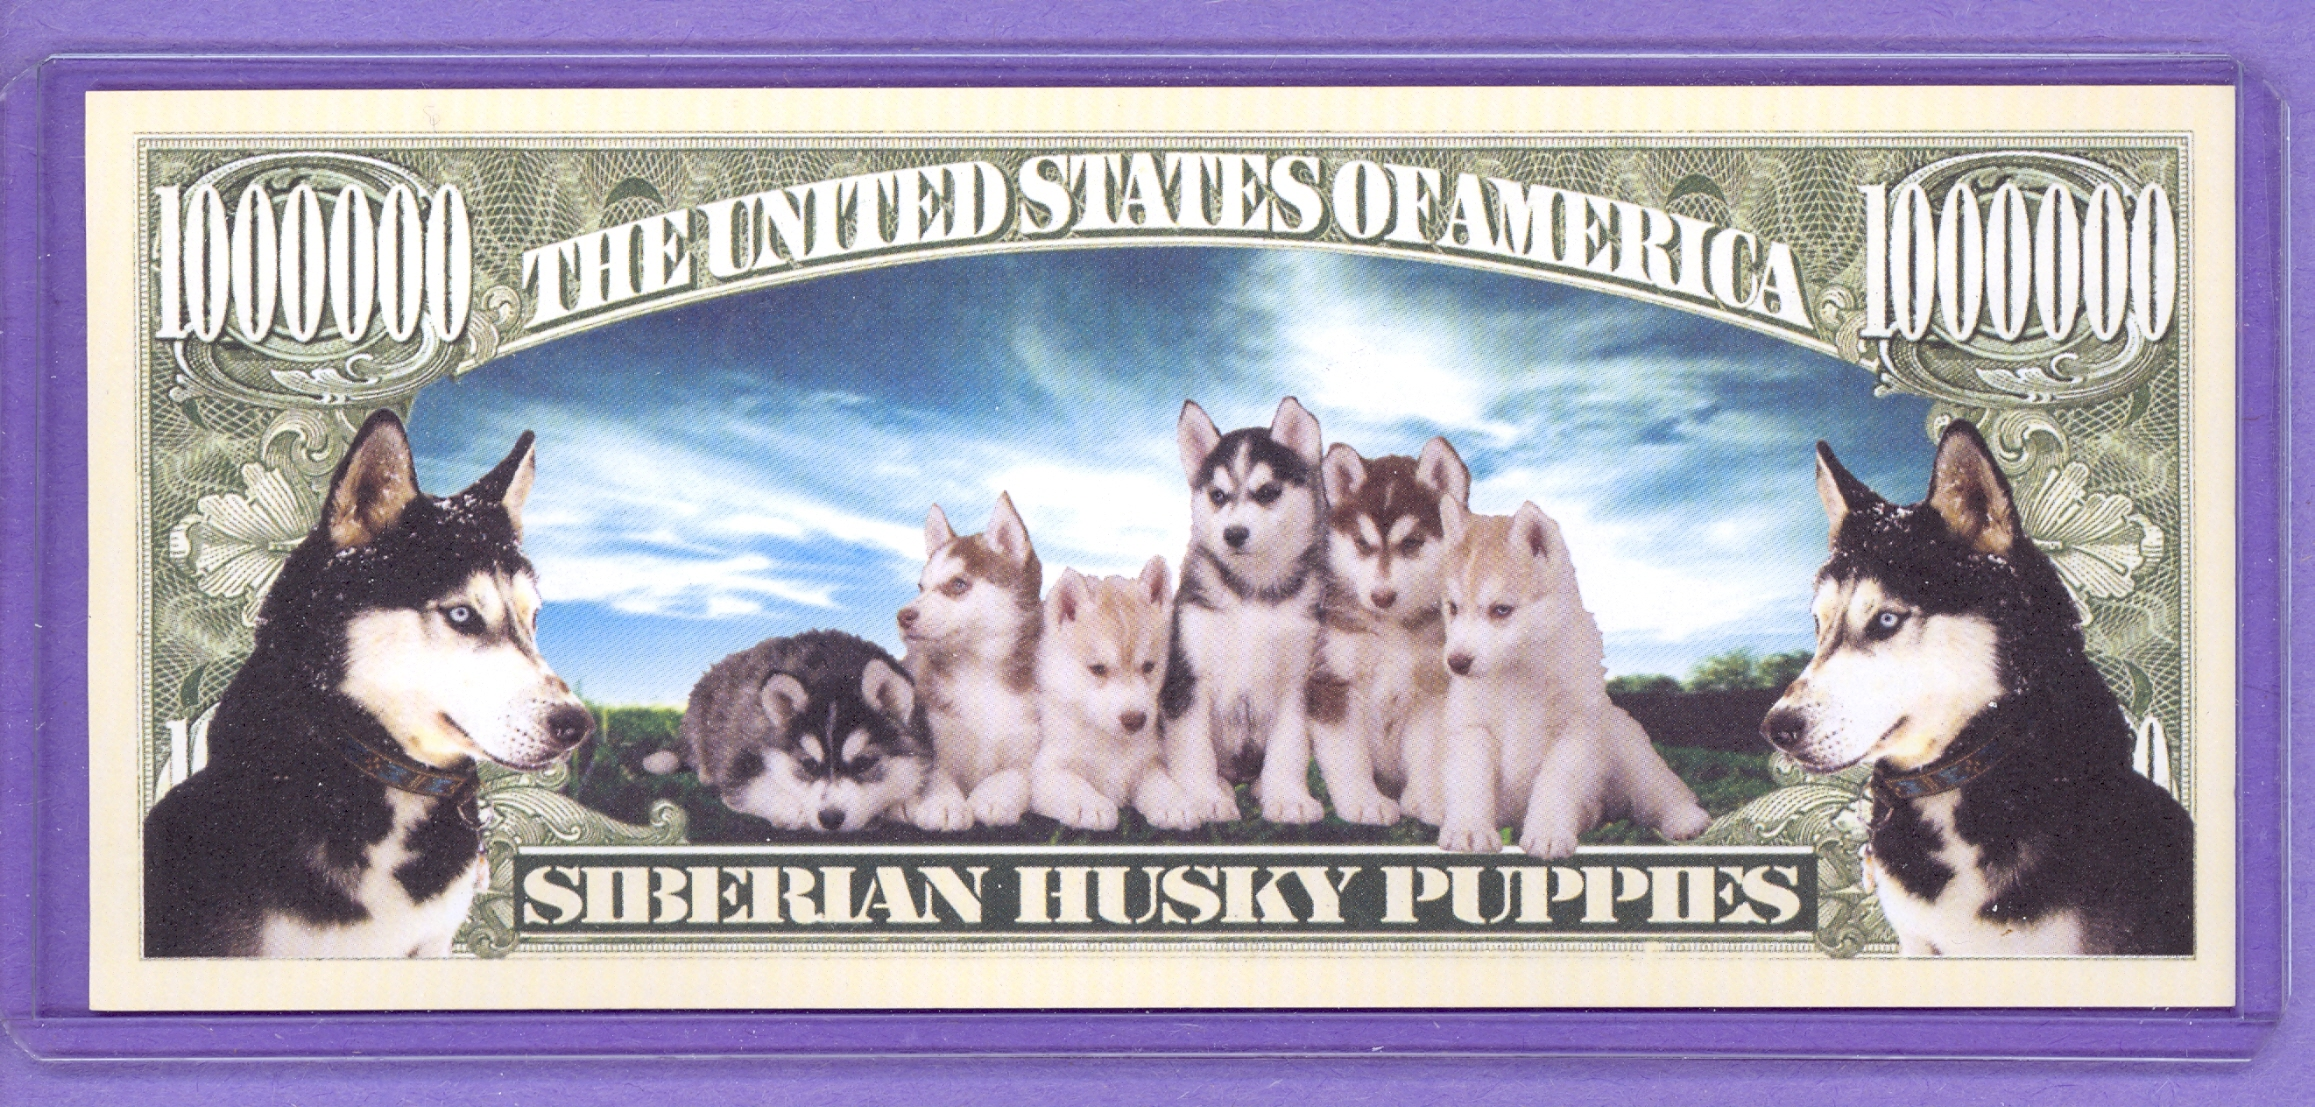 Siberian Husky Puppies $1,000,000 Fantasy or Novelty Note